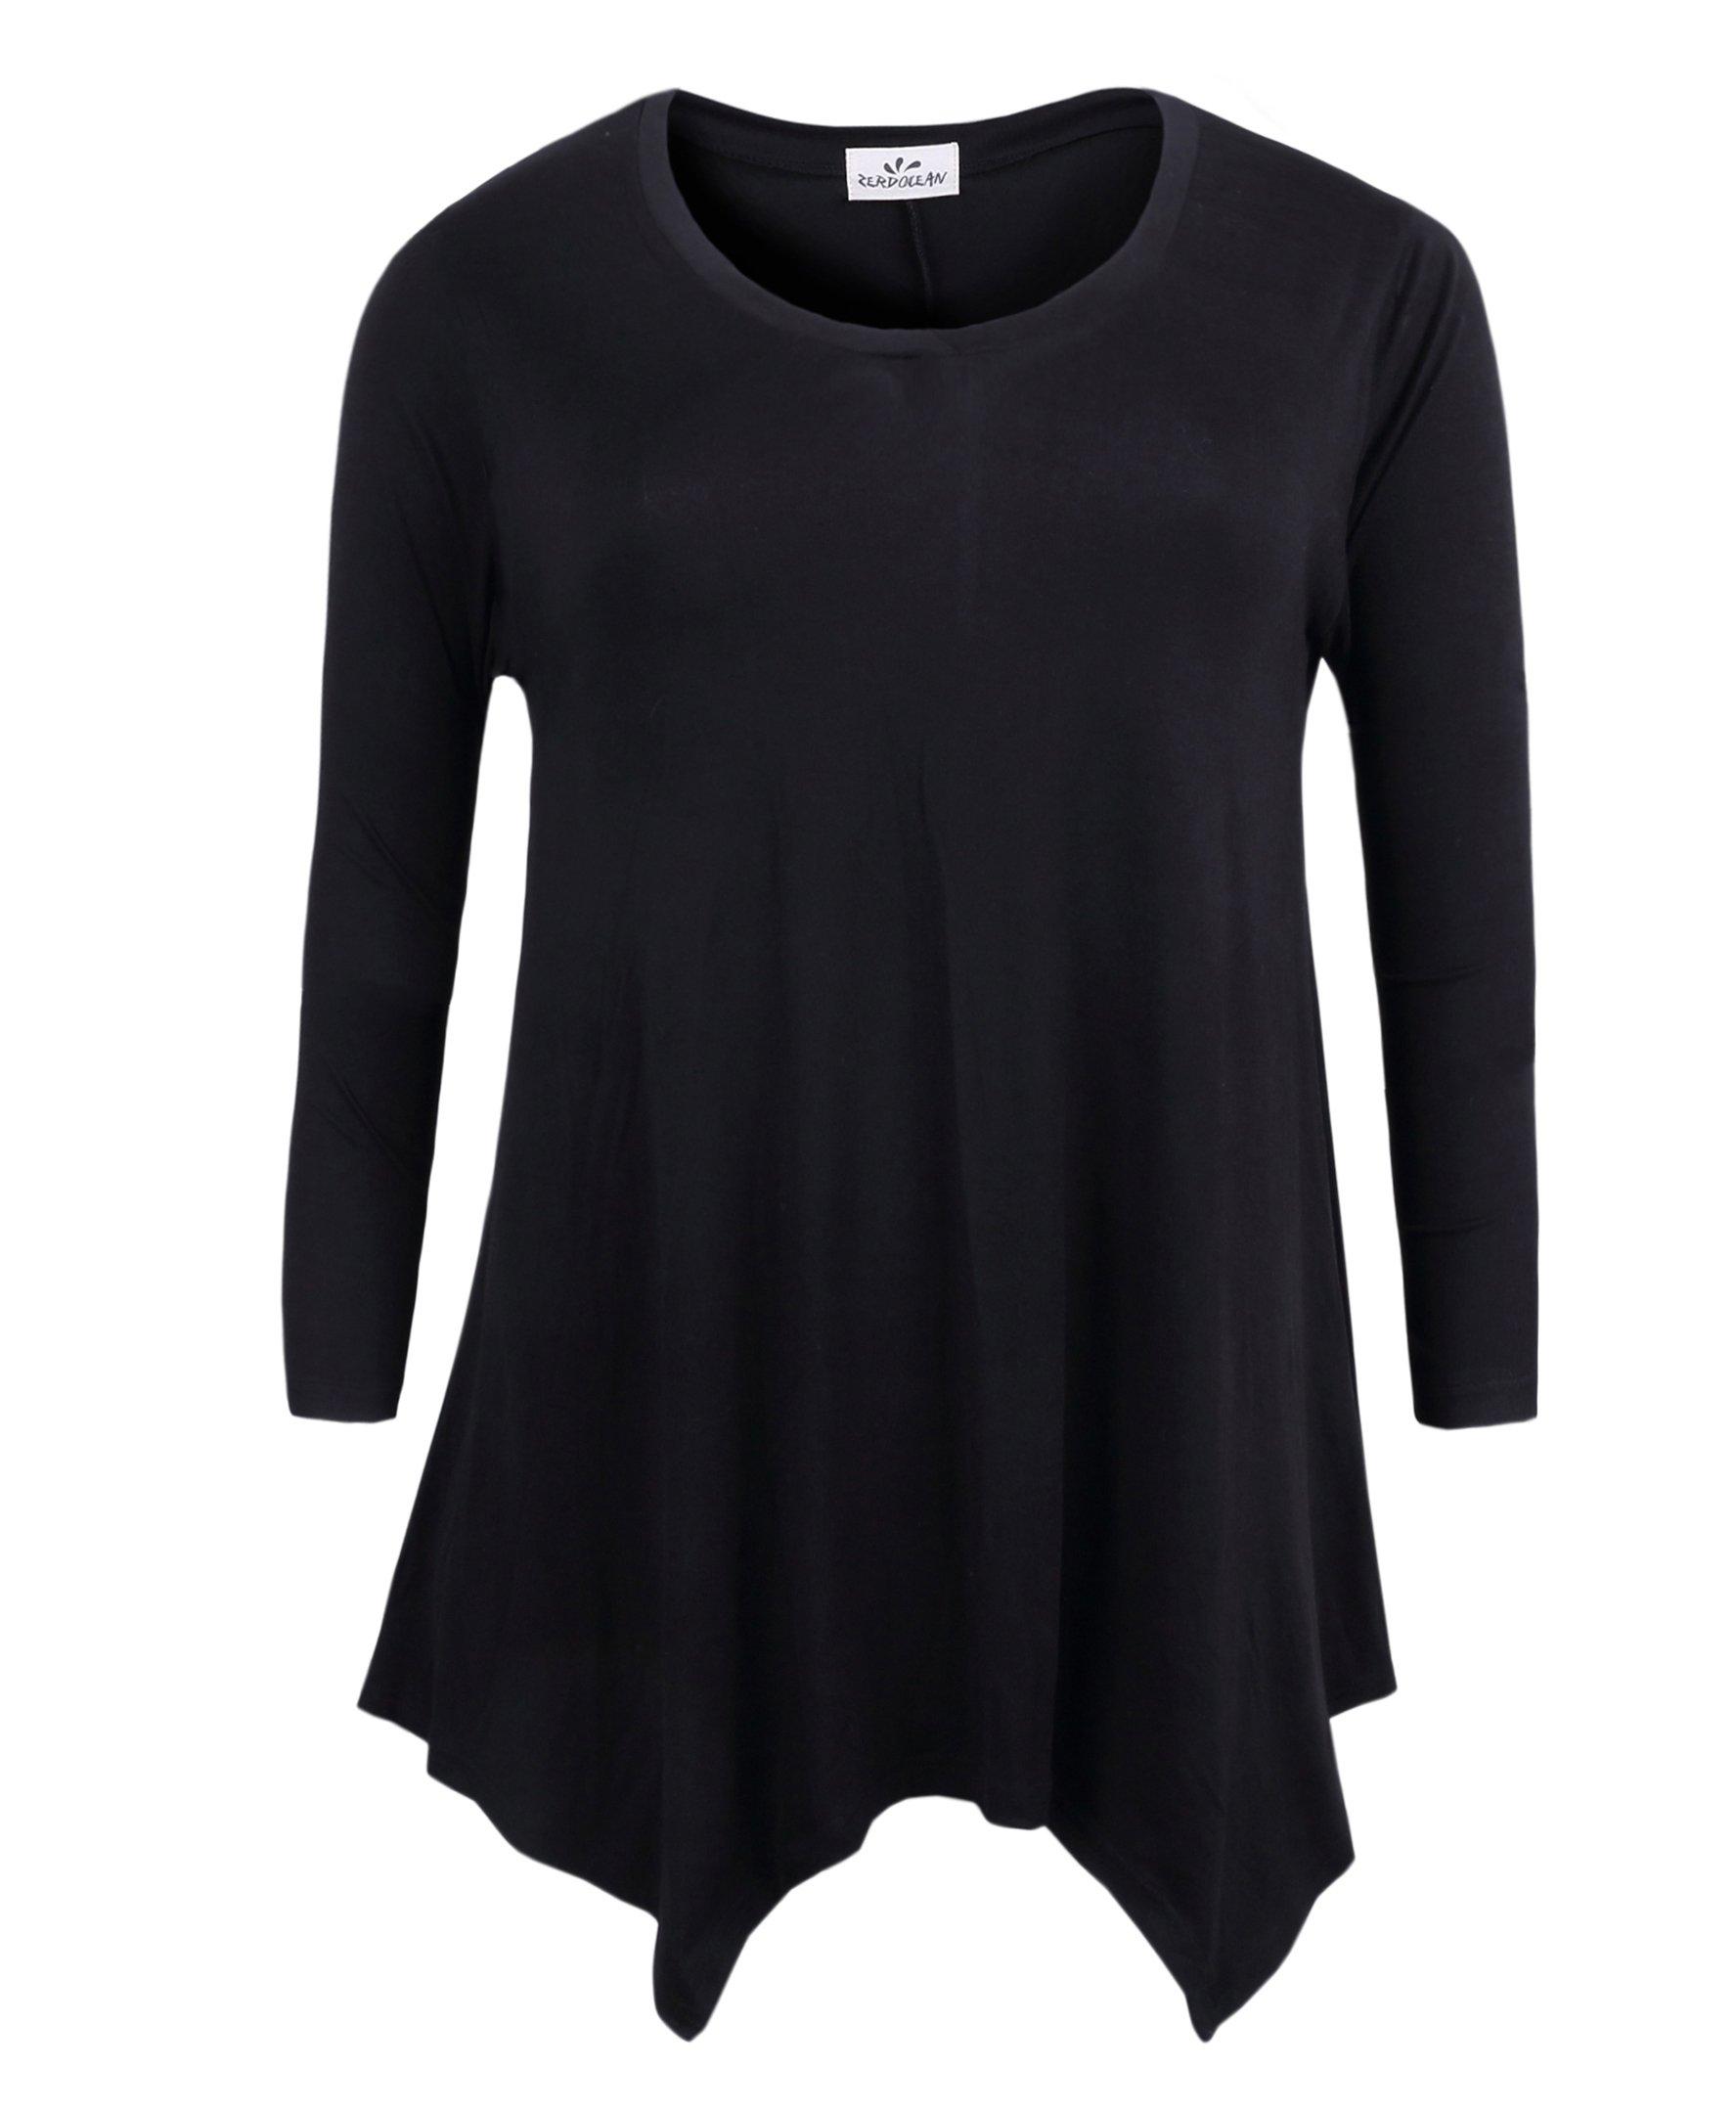 ZERDOCEAN Women's Plus Size Long Sleeve Printed Tunic Flowy Top Loose Fit Shirt Black 2X